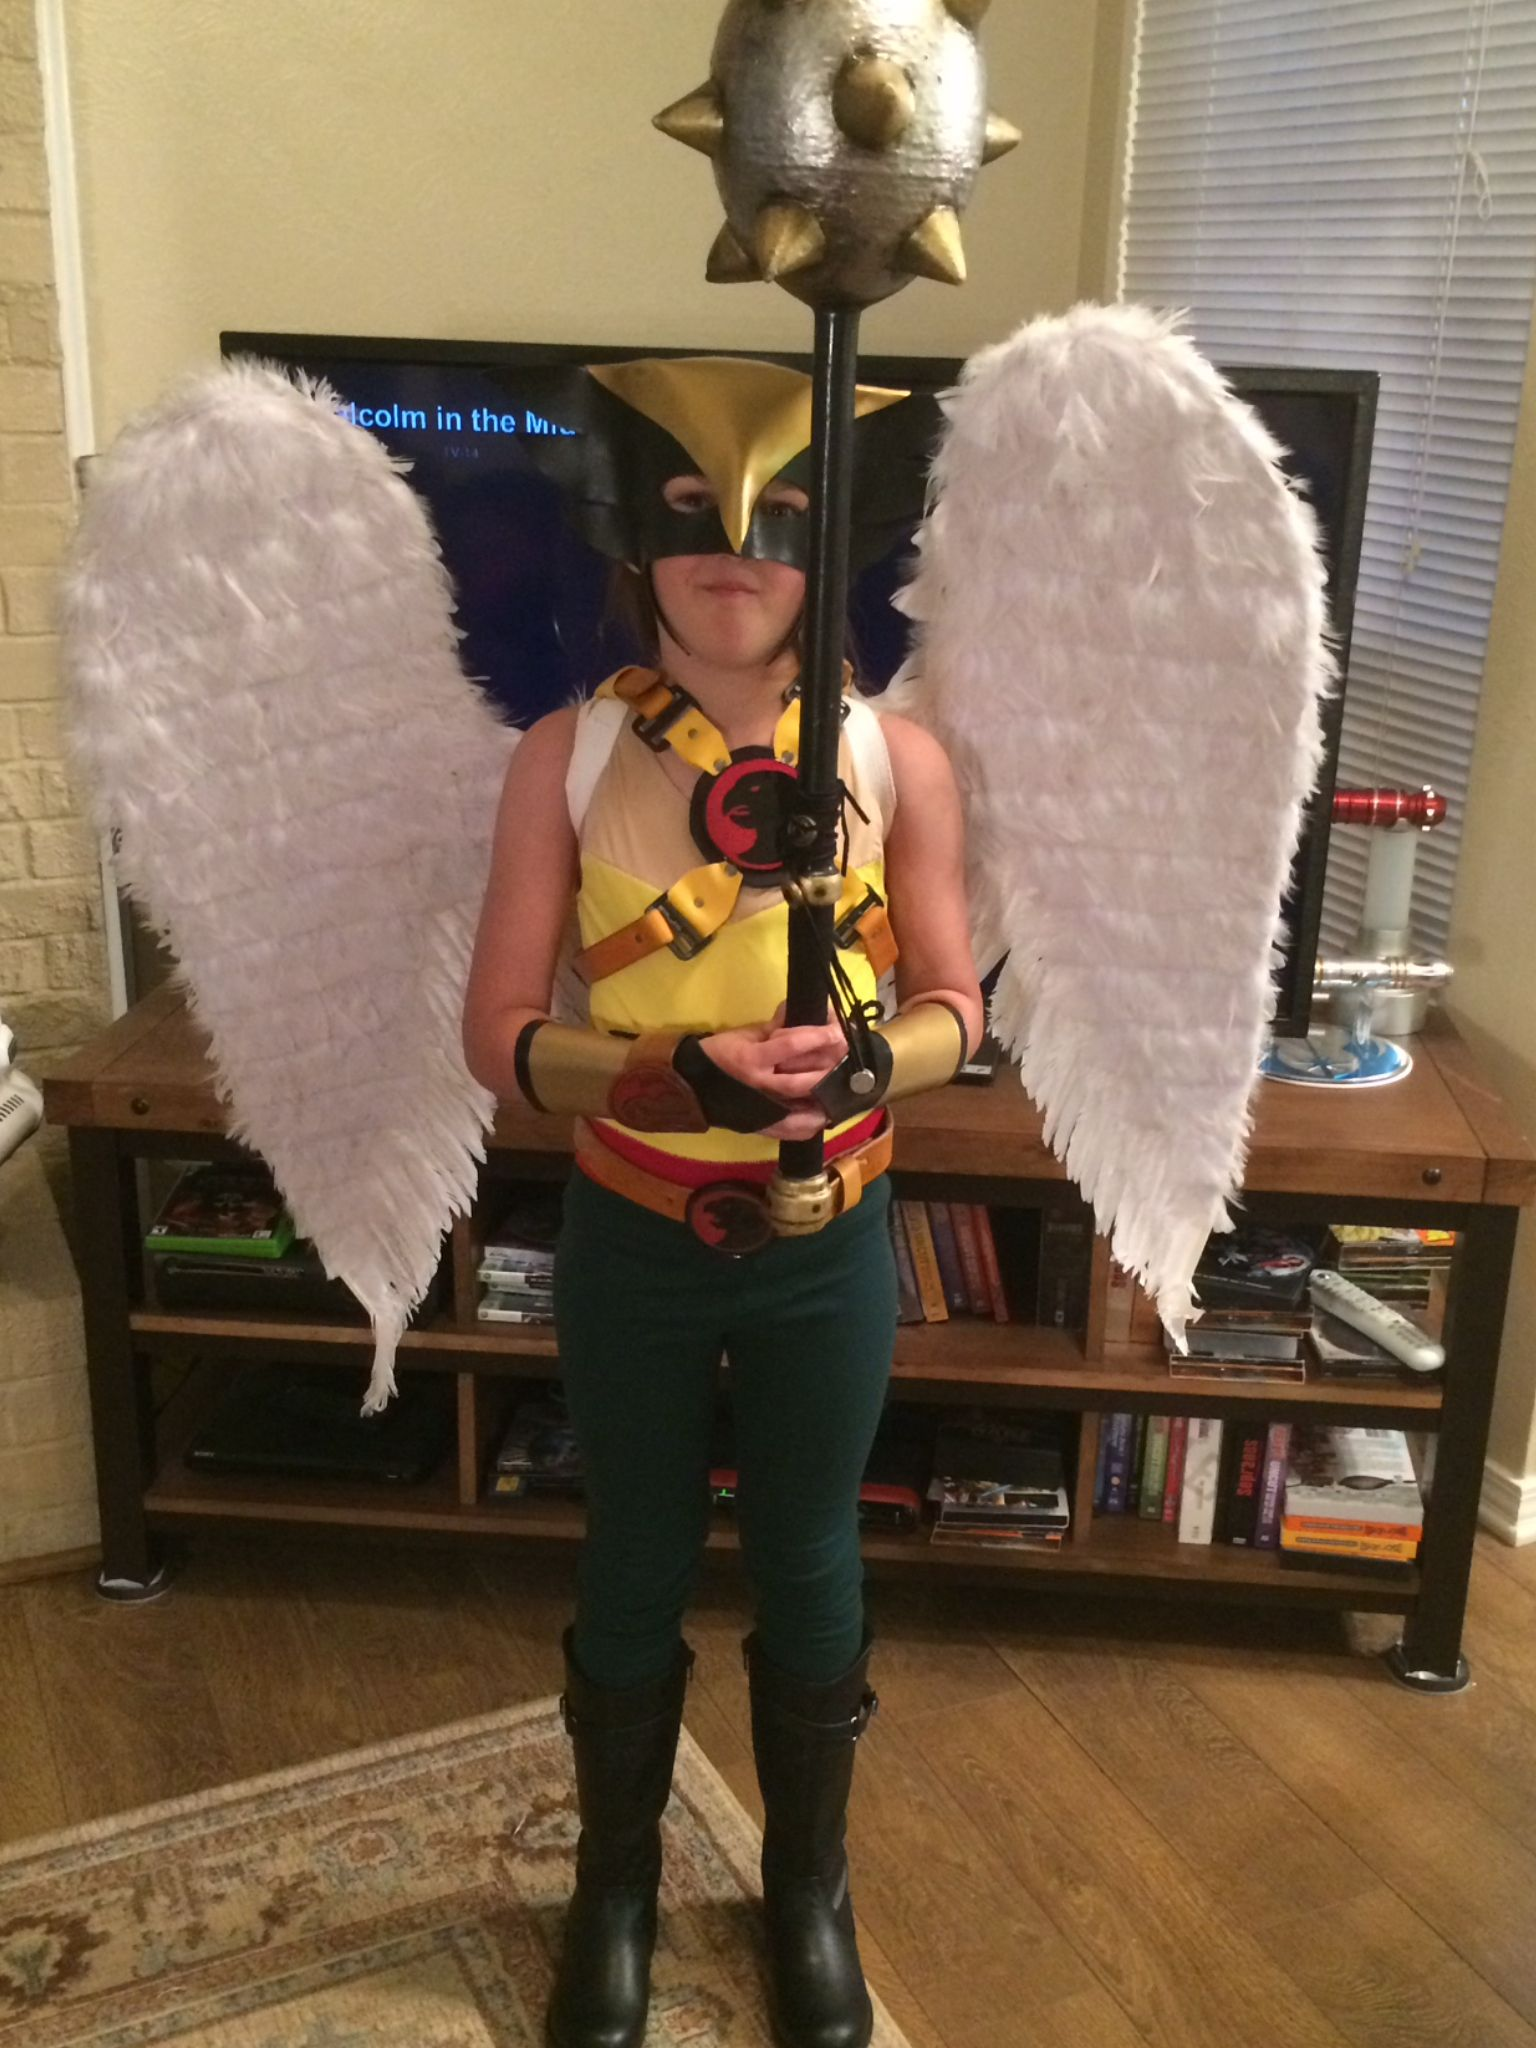 HawkGirl Halloween Costume | Hawkgirl, Halloween costumes and Costumes